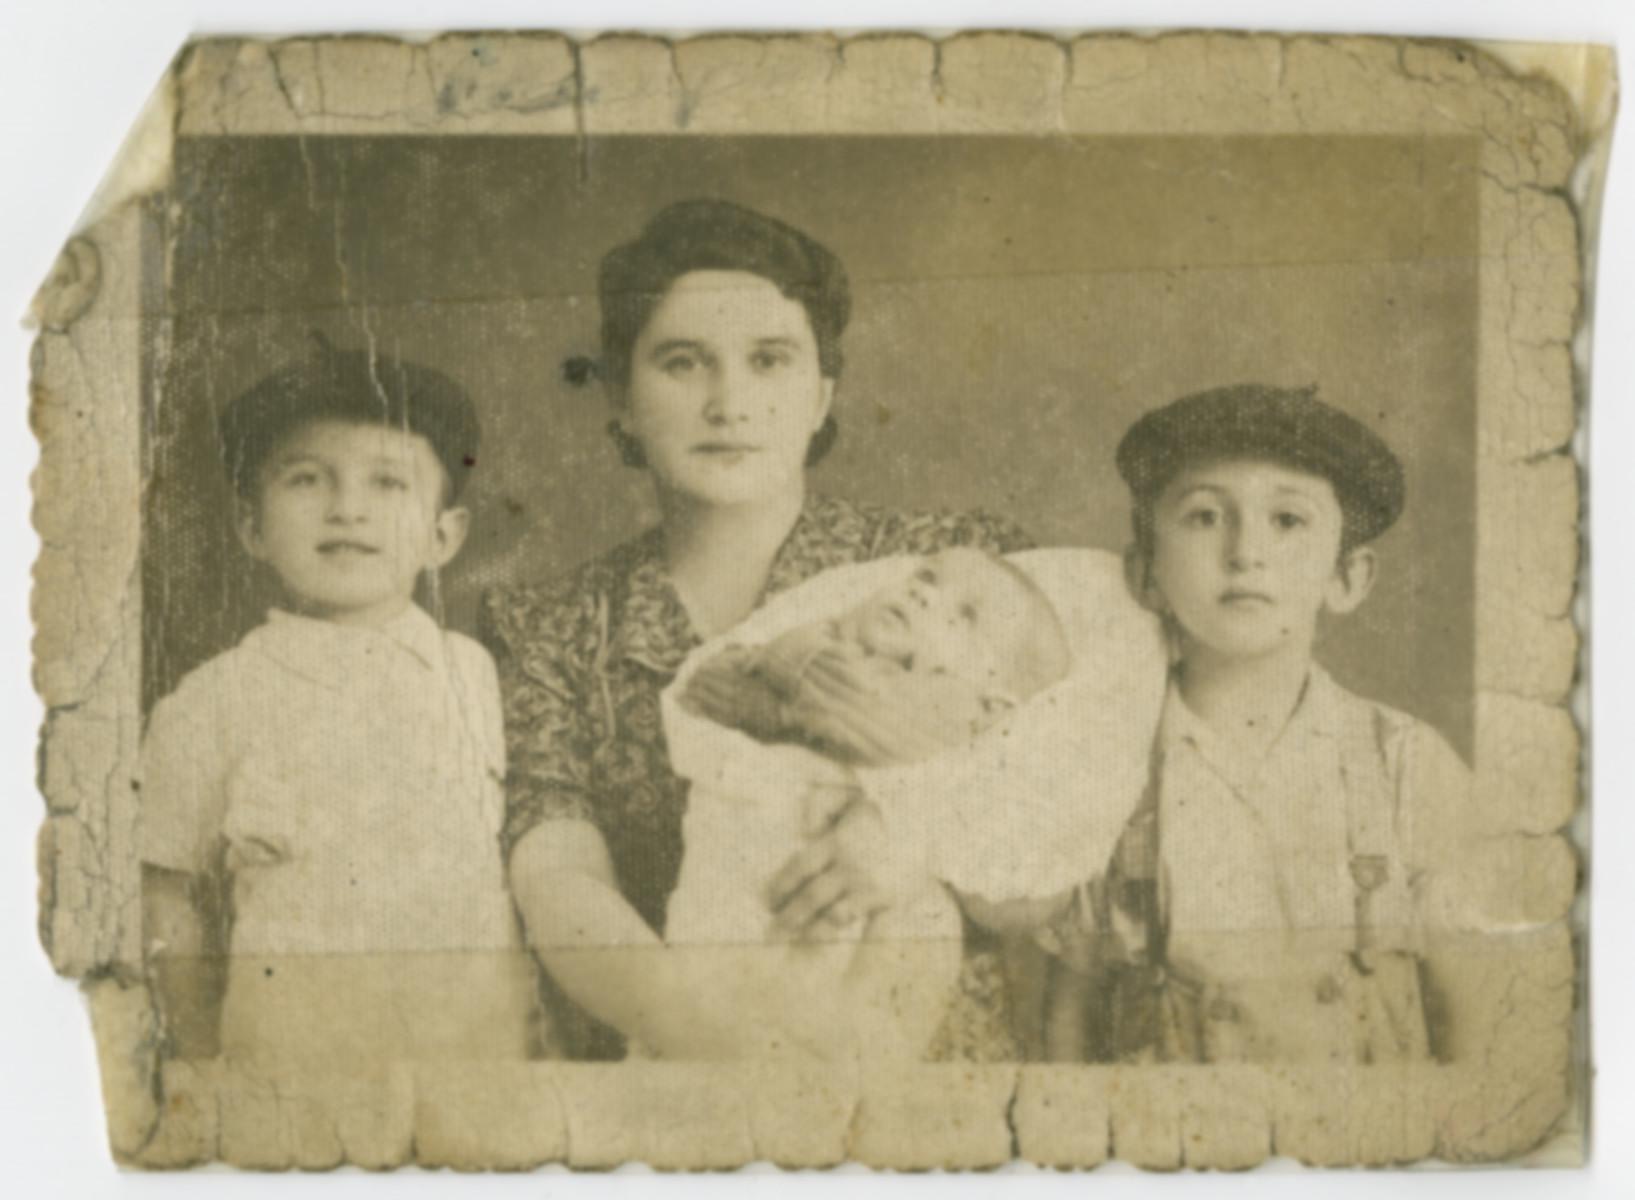 Ilona (Toba) Seidenfeld poses for a family portrait with her sons Ezra (left), Mordche (right), and Mojsche.